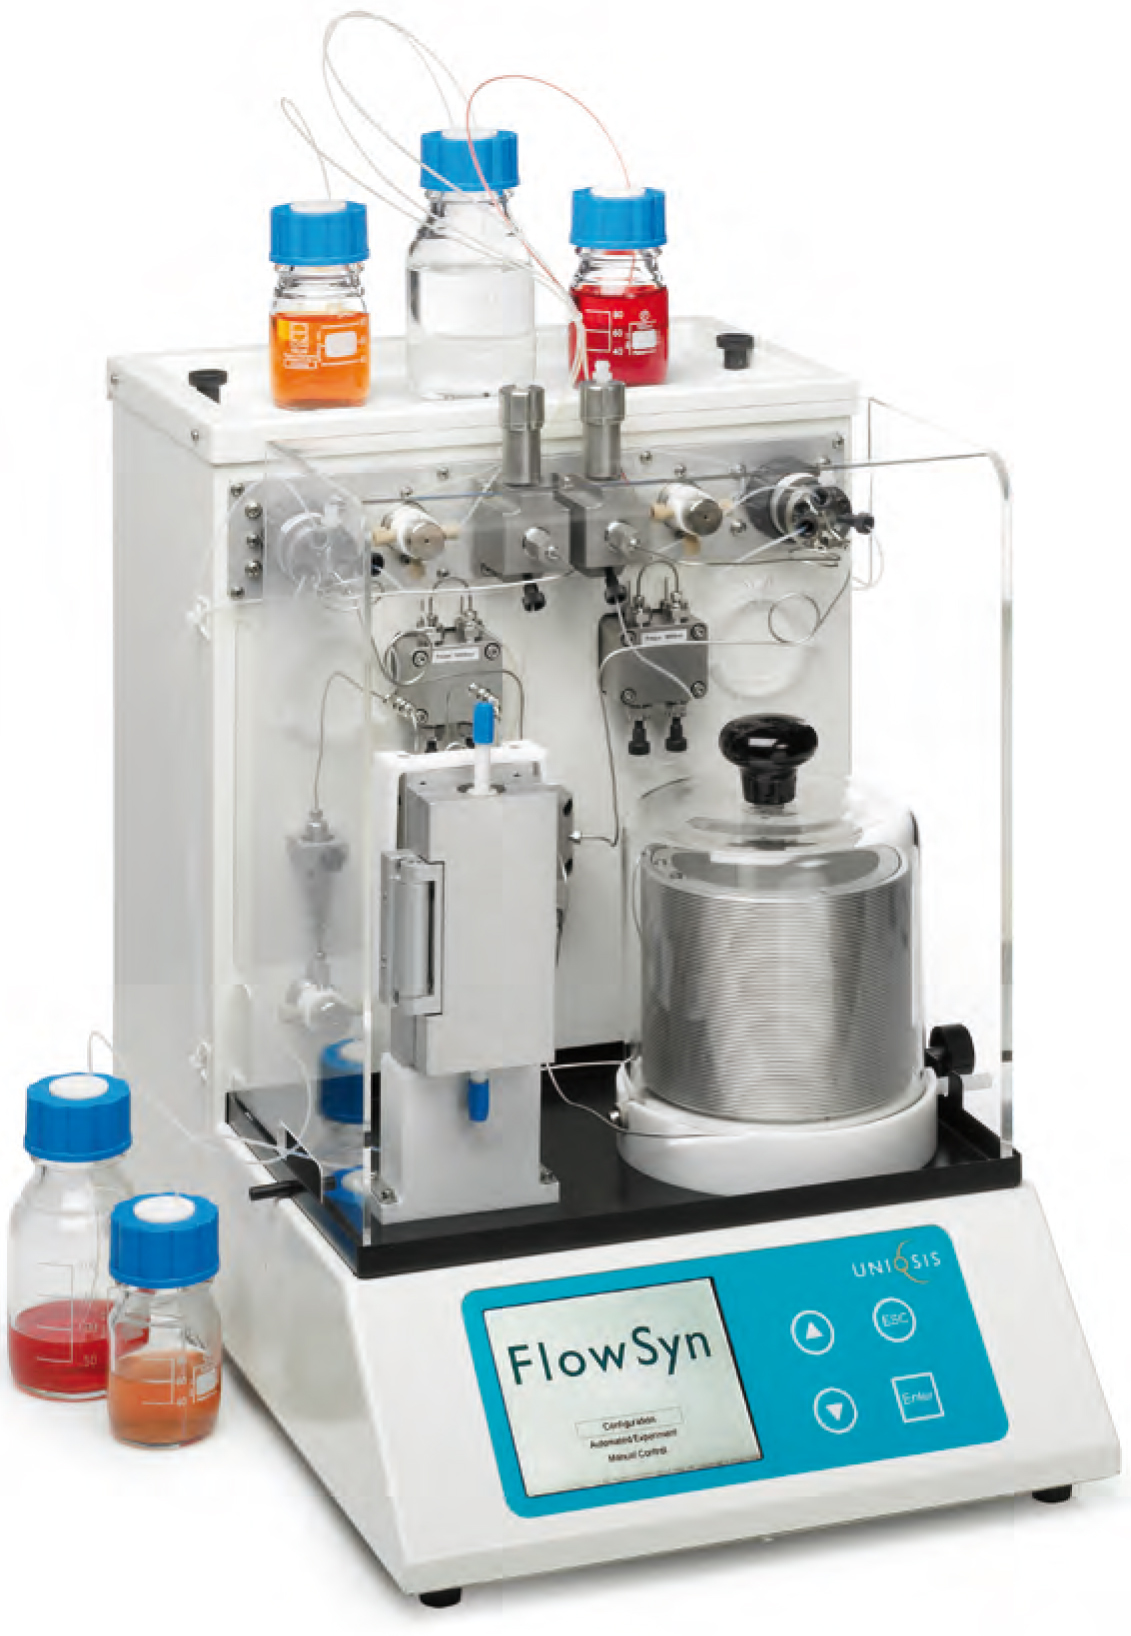 FlowSyn_Flow_chemistry_Interchim_blog_0616